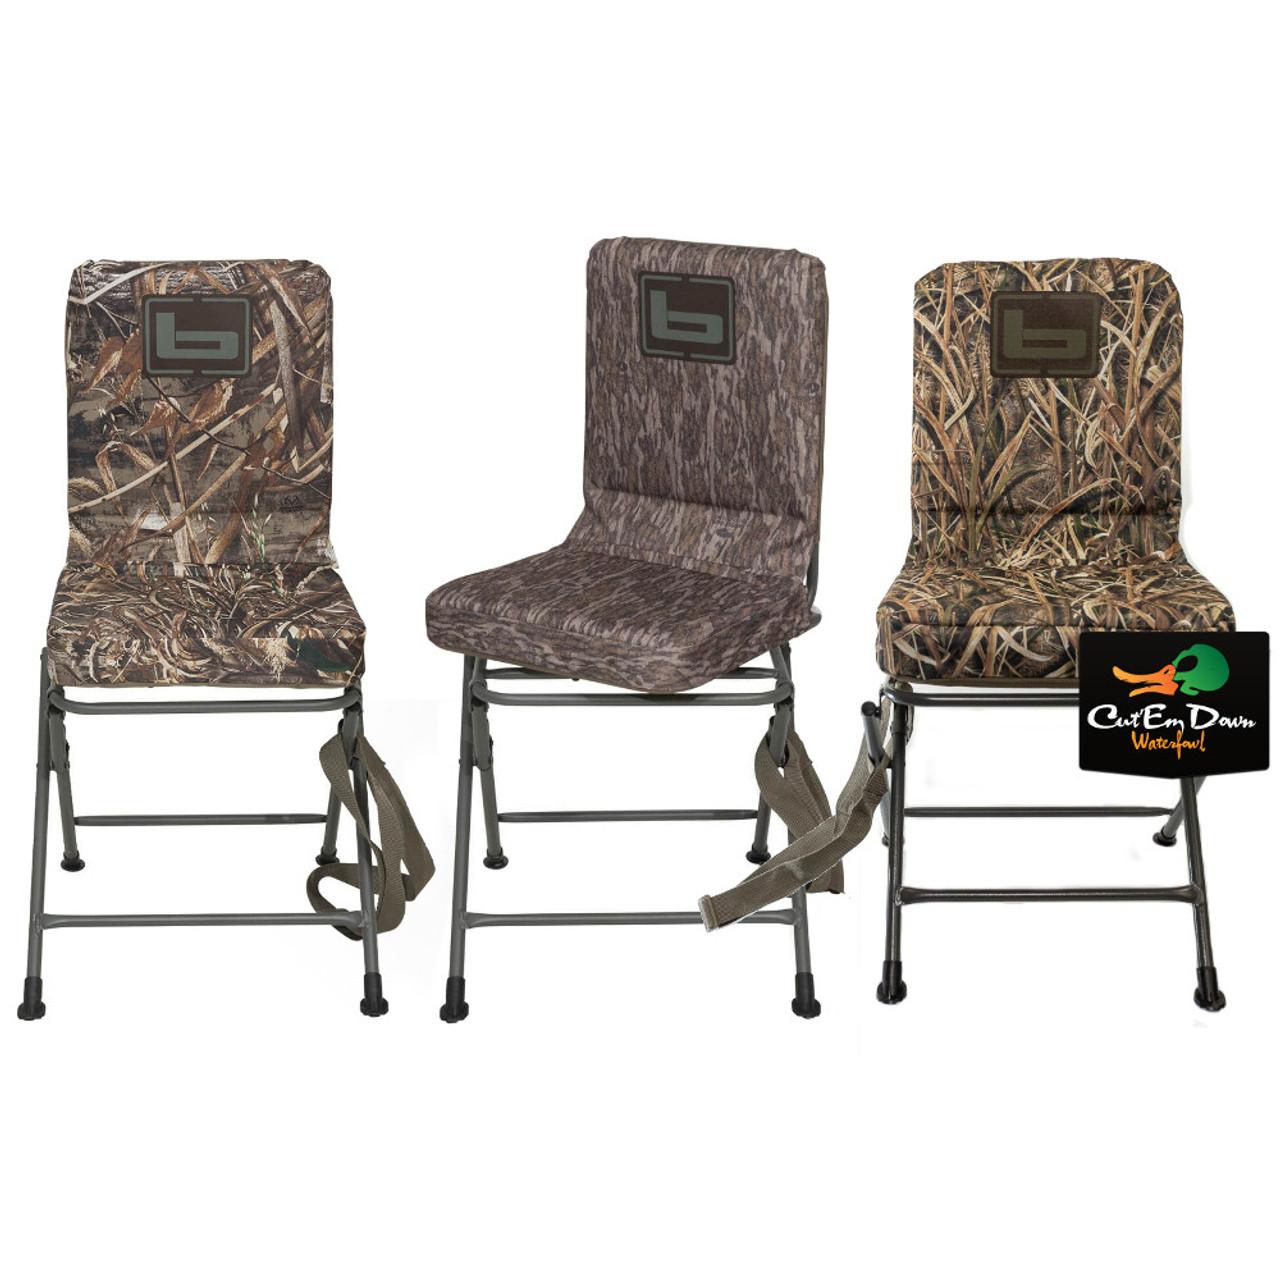 Sensational Banded Gear Swivel Blind Chair Theyellowbook Wood Chair Design Ideas Theyellowbookinfo